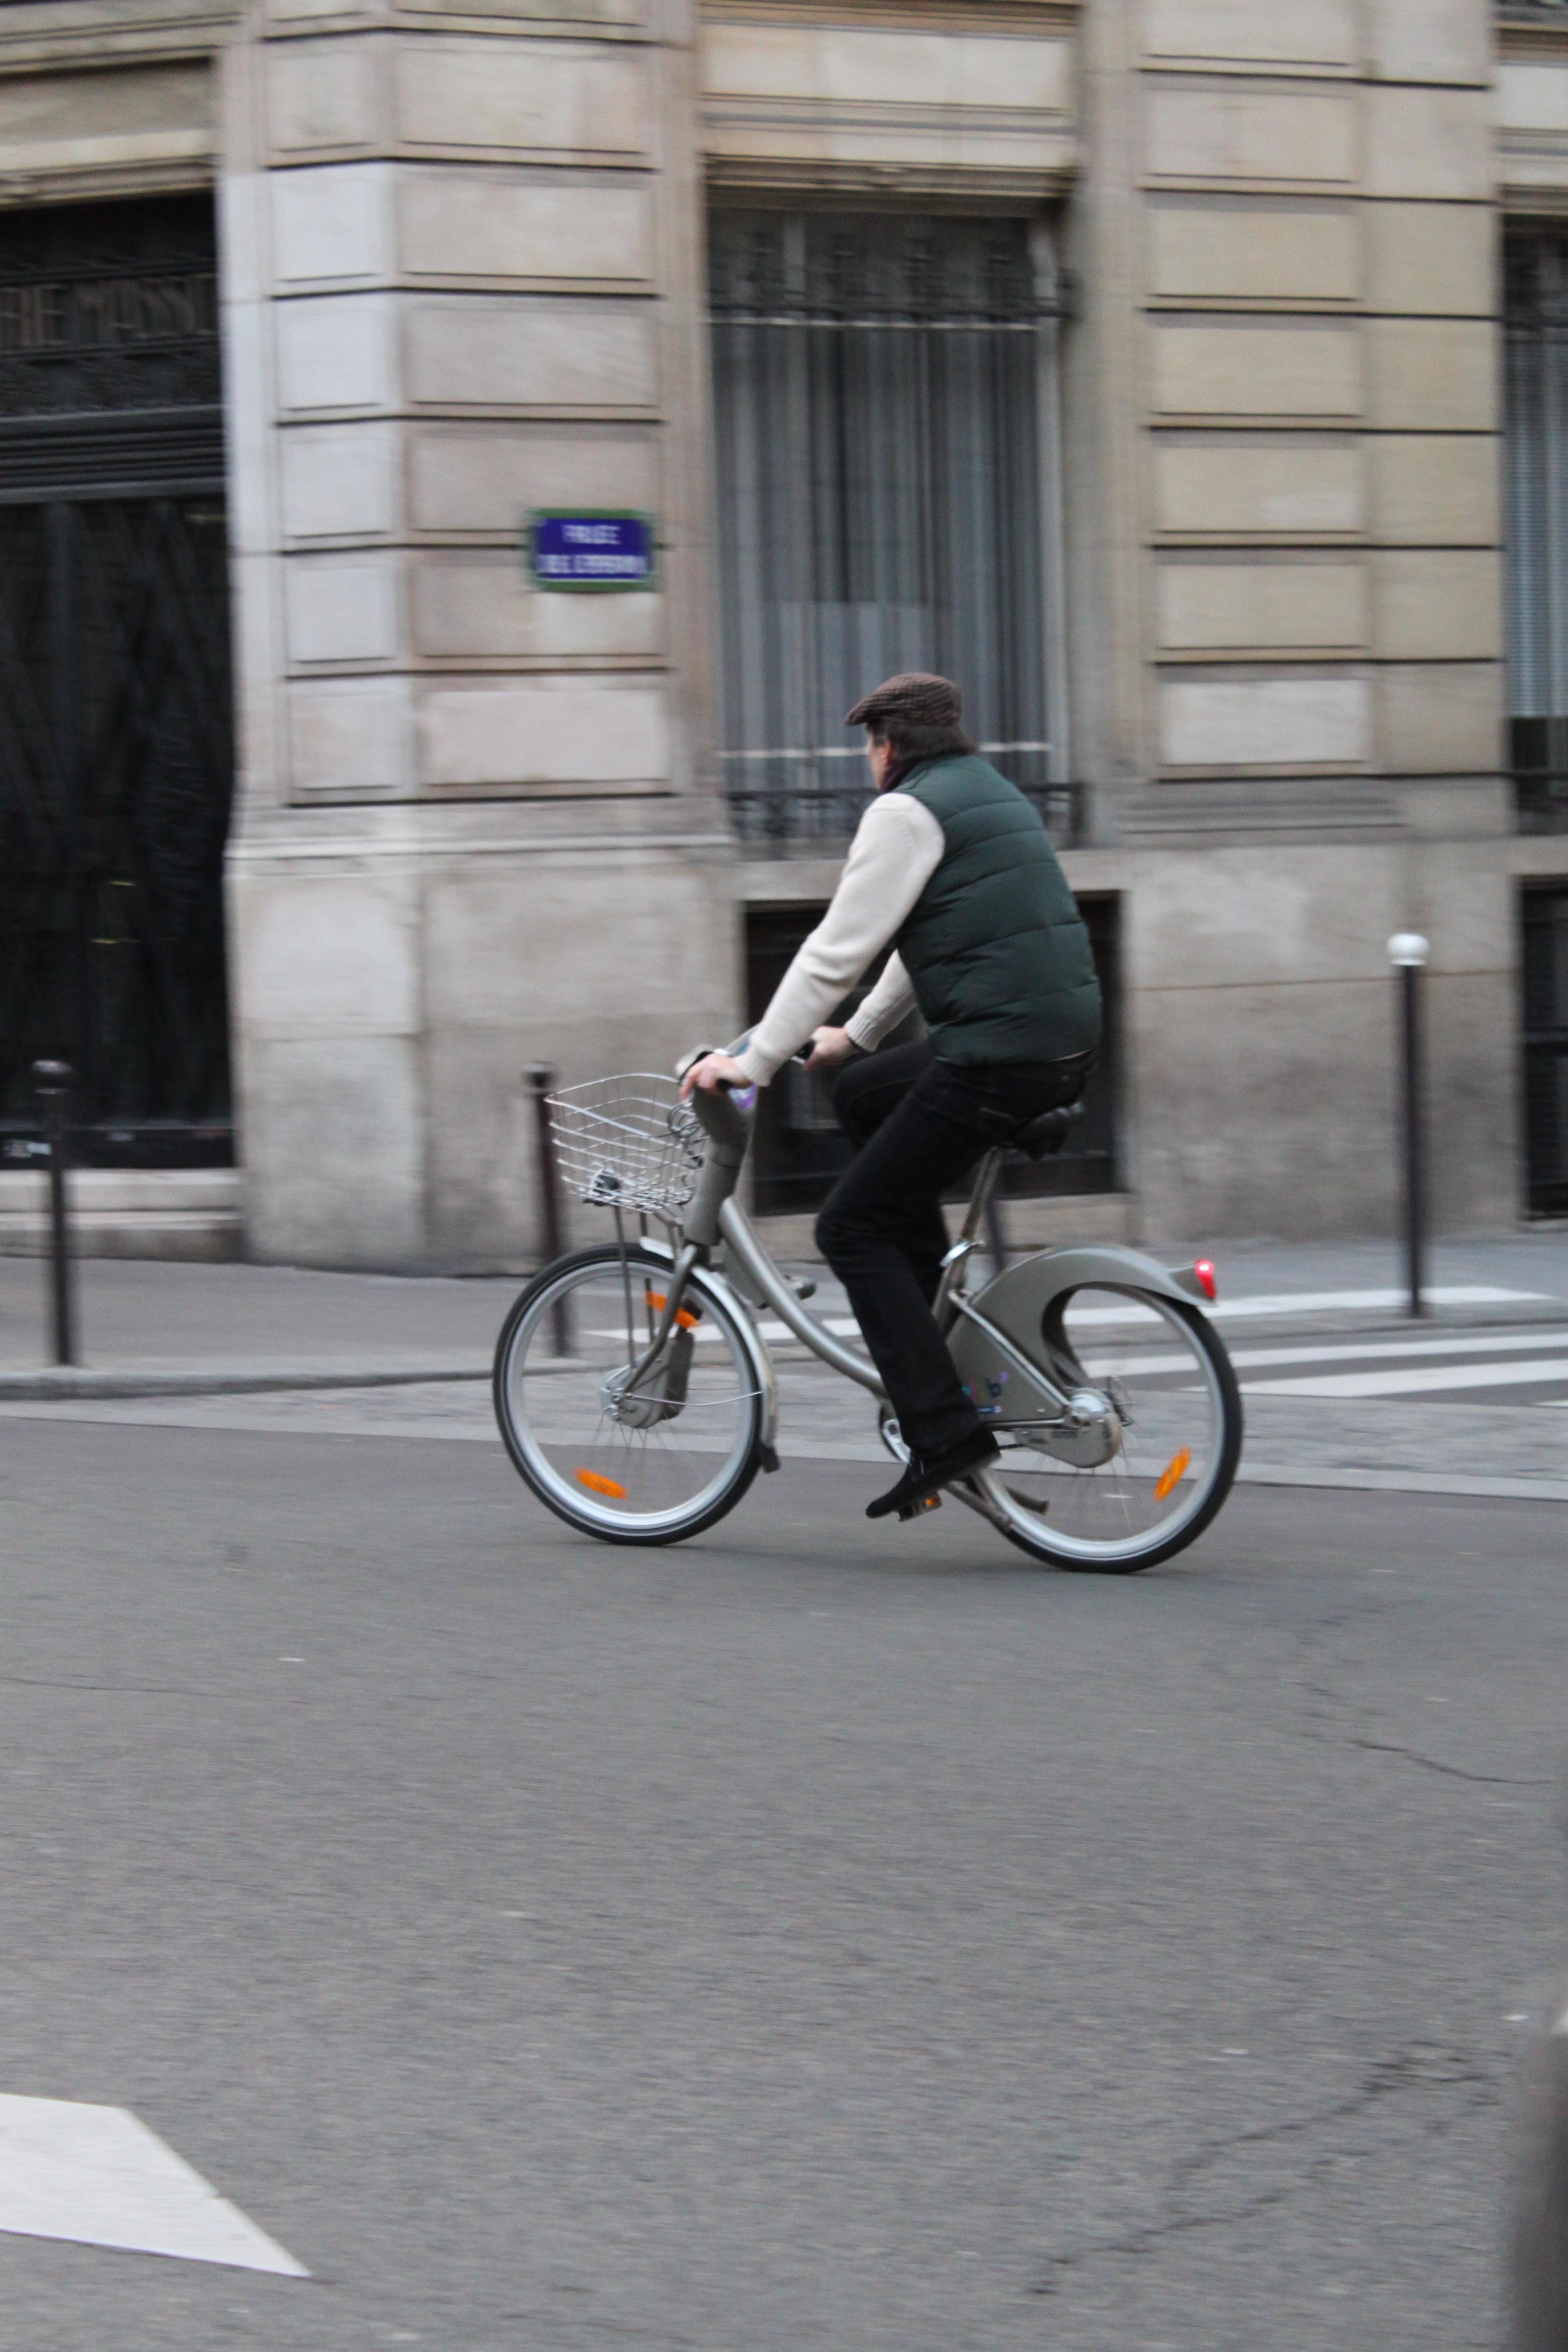 Street Cycle